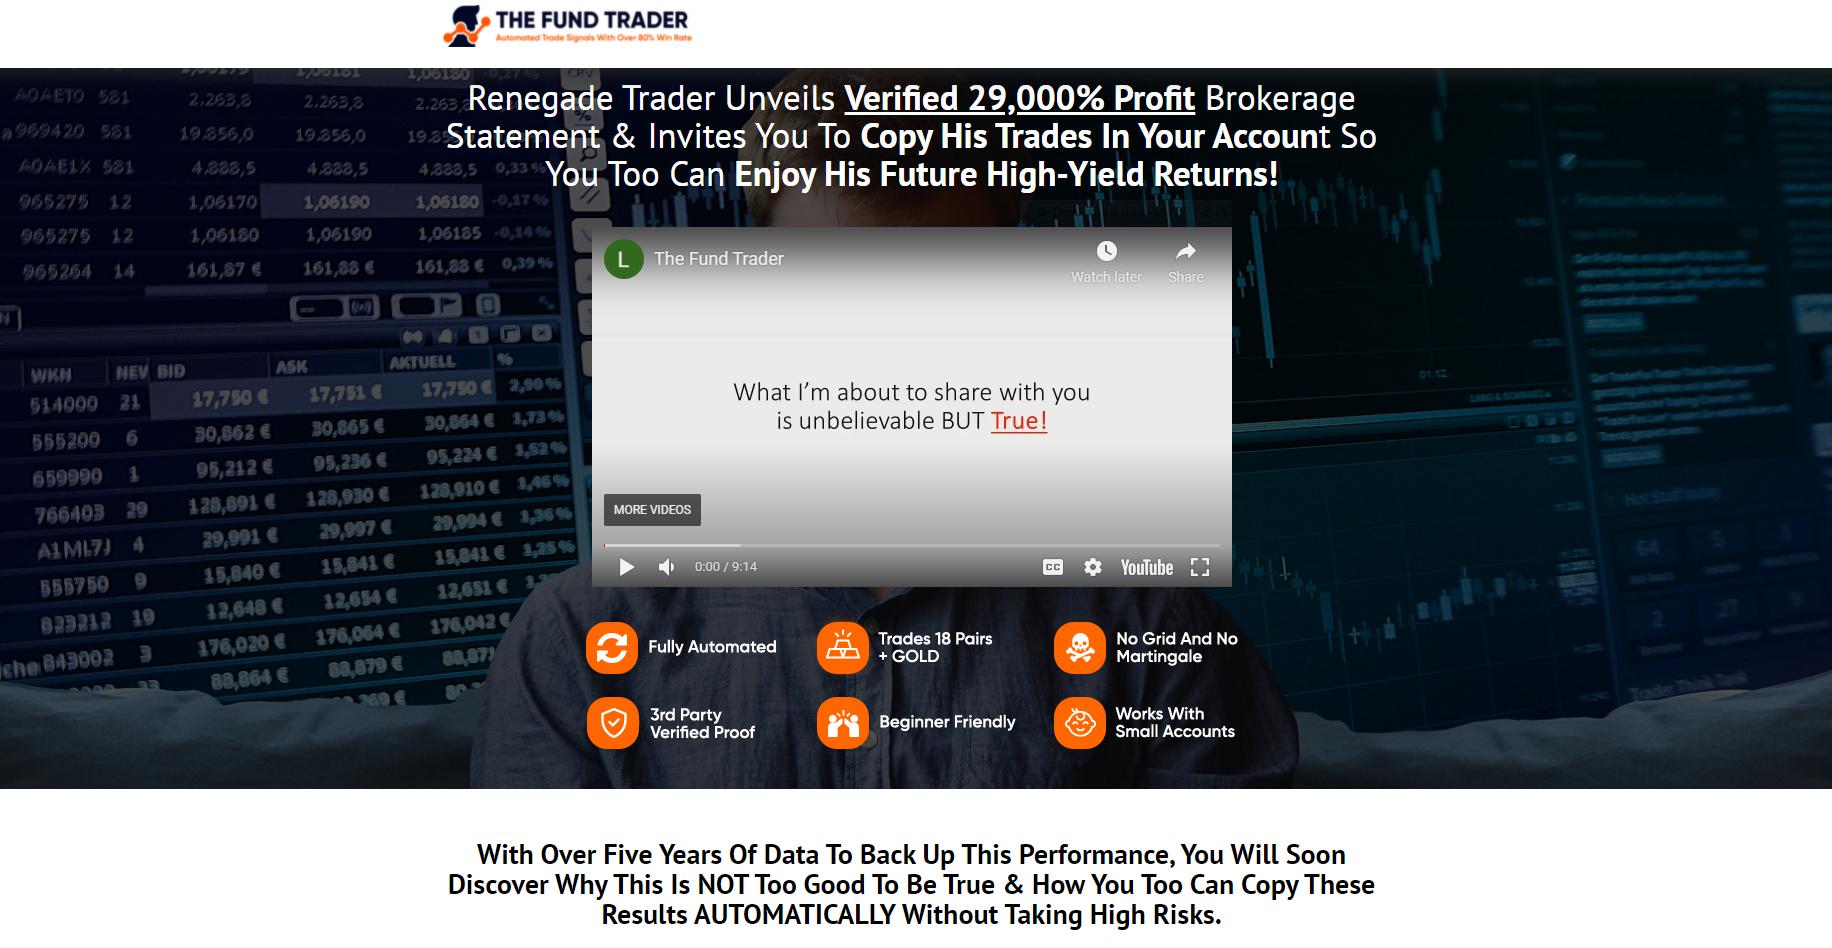 The Fund Trader presentation